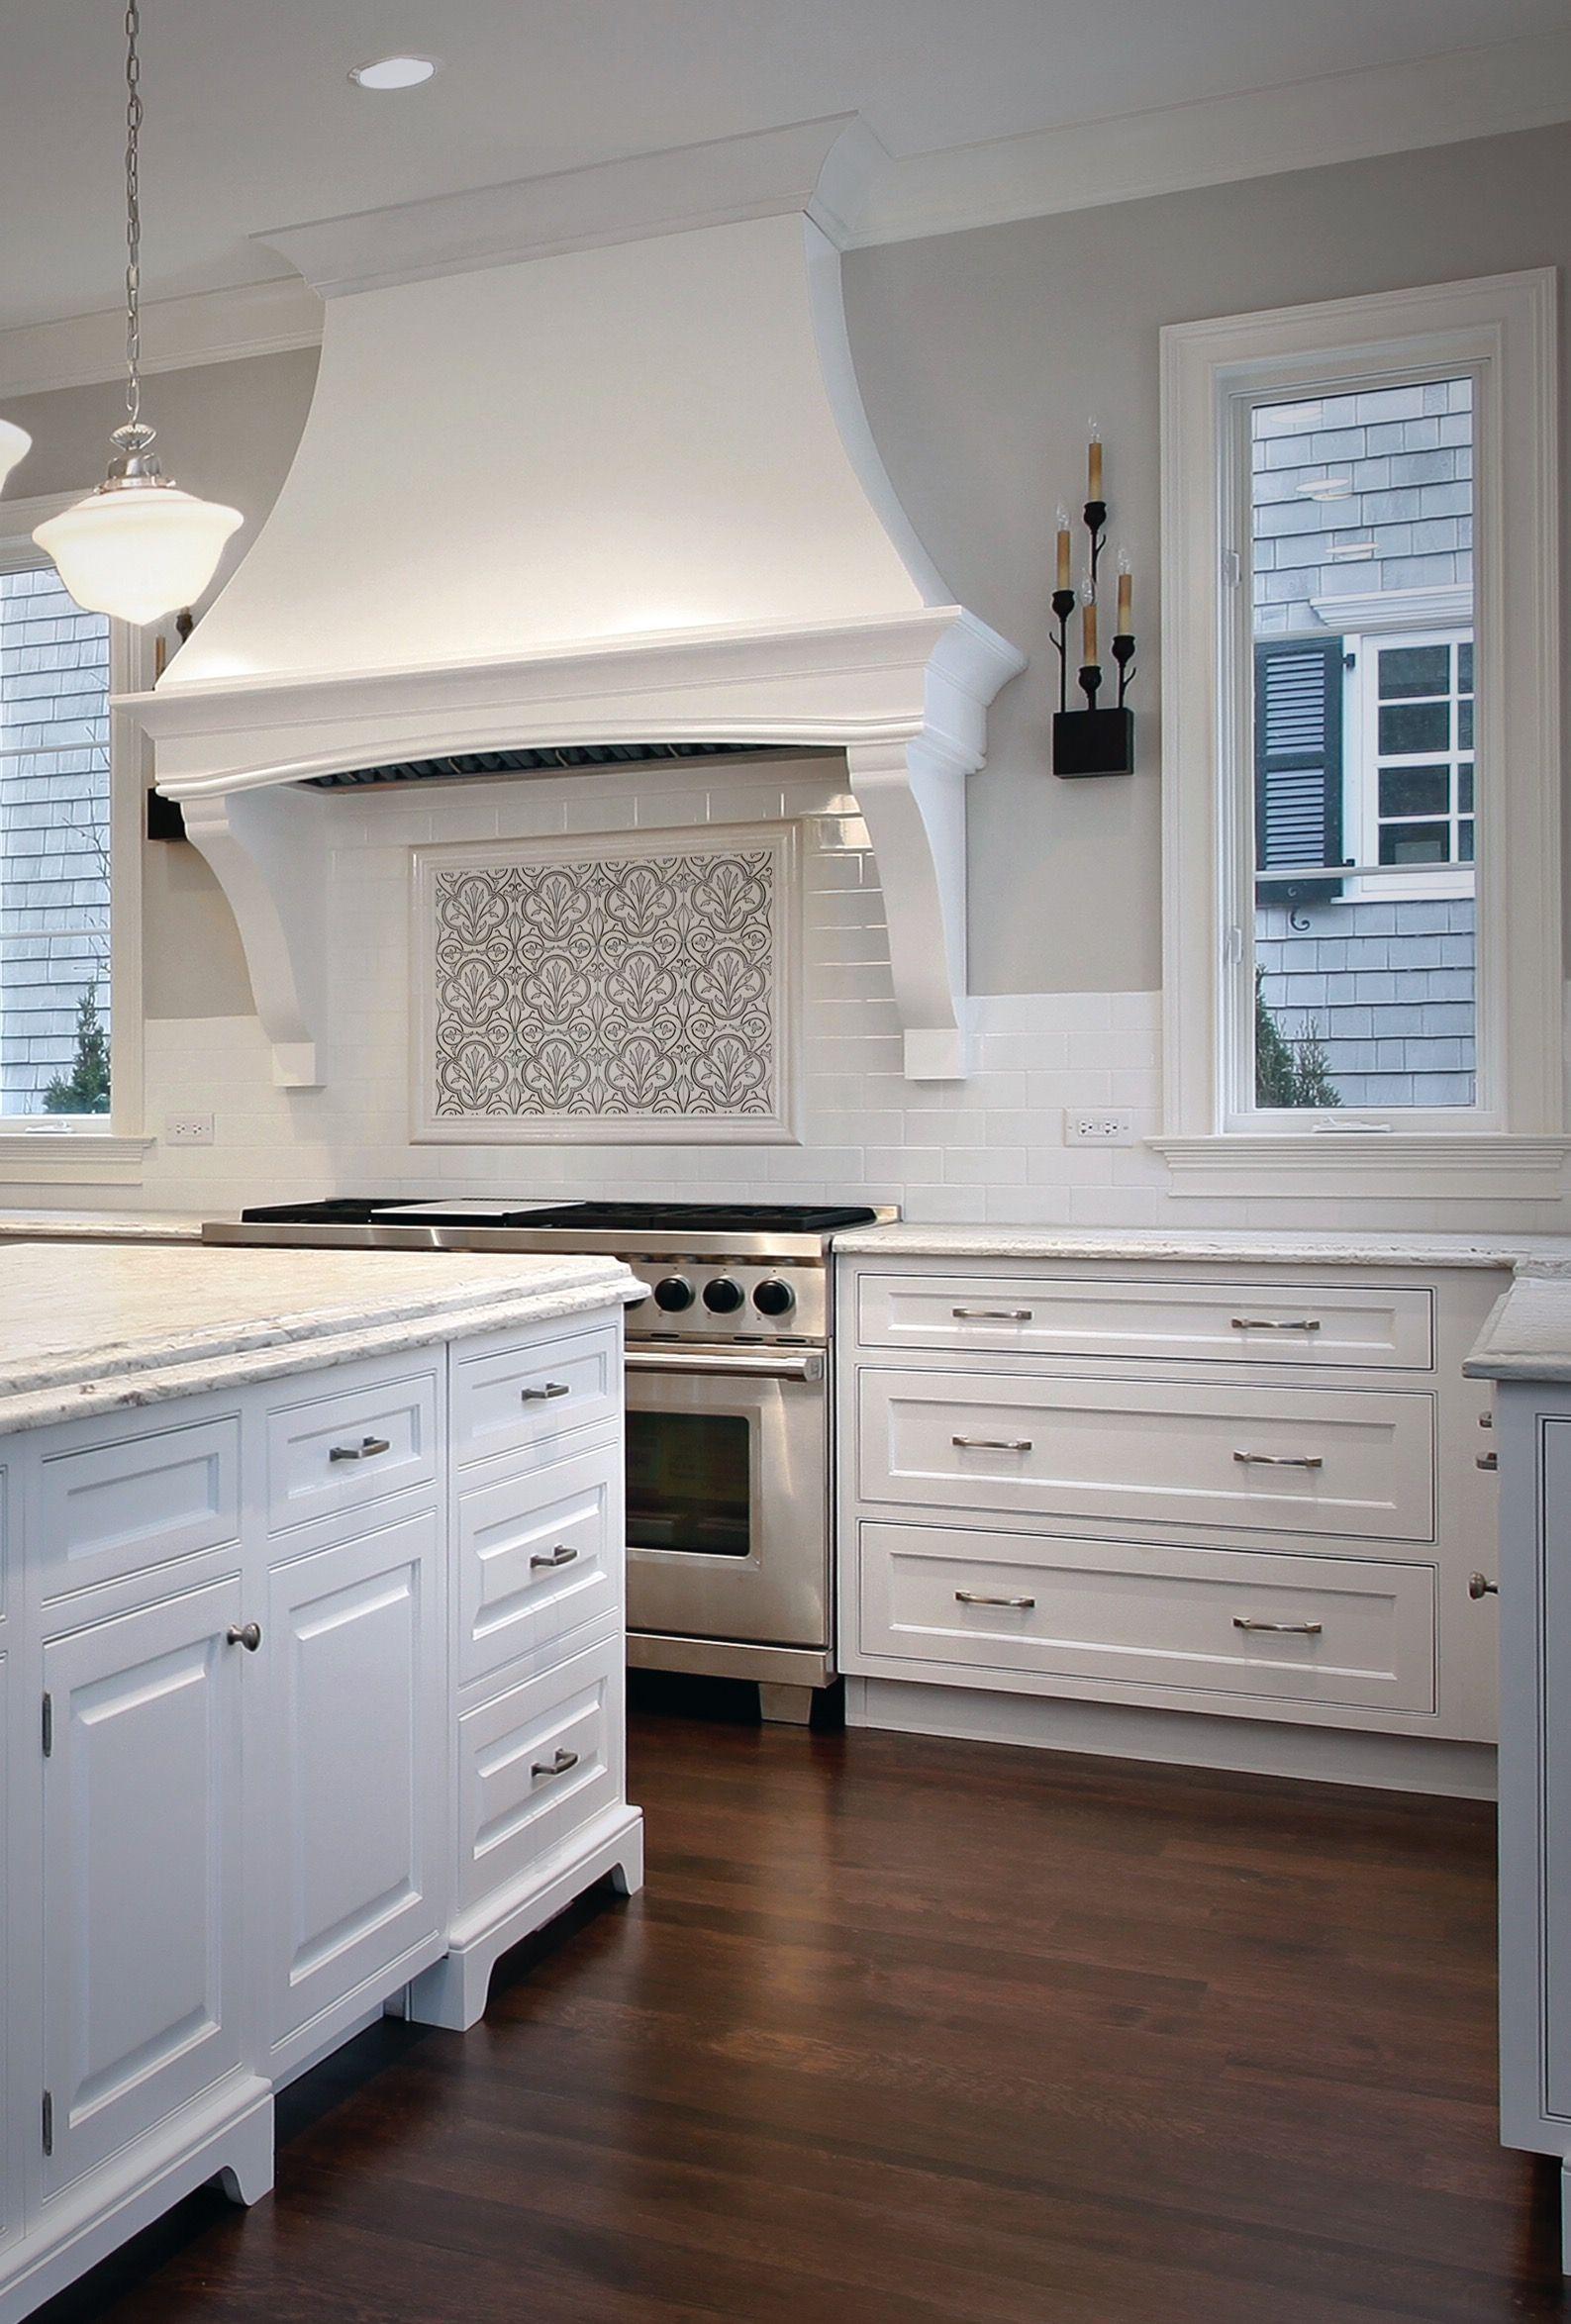 Devonshire Collection in 2020 Kitchen design, Stove